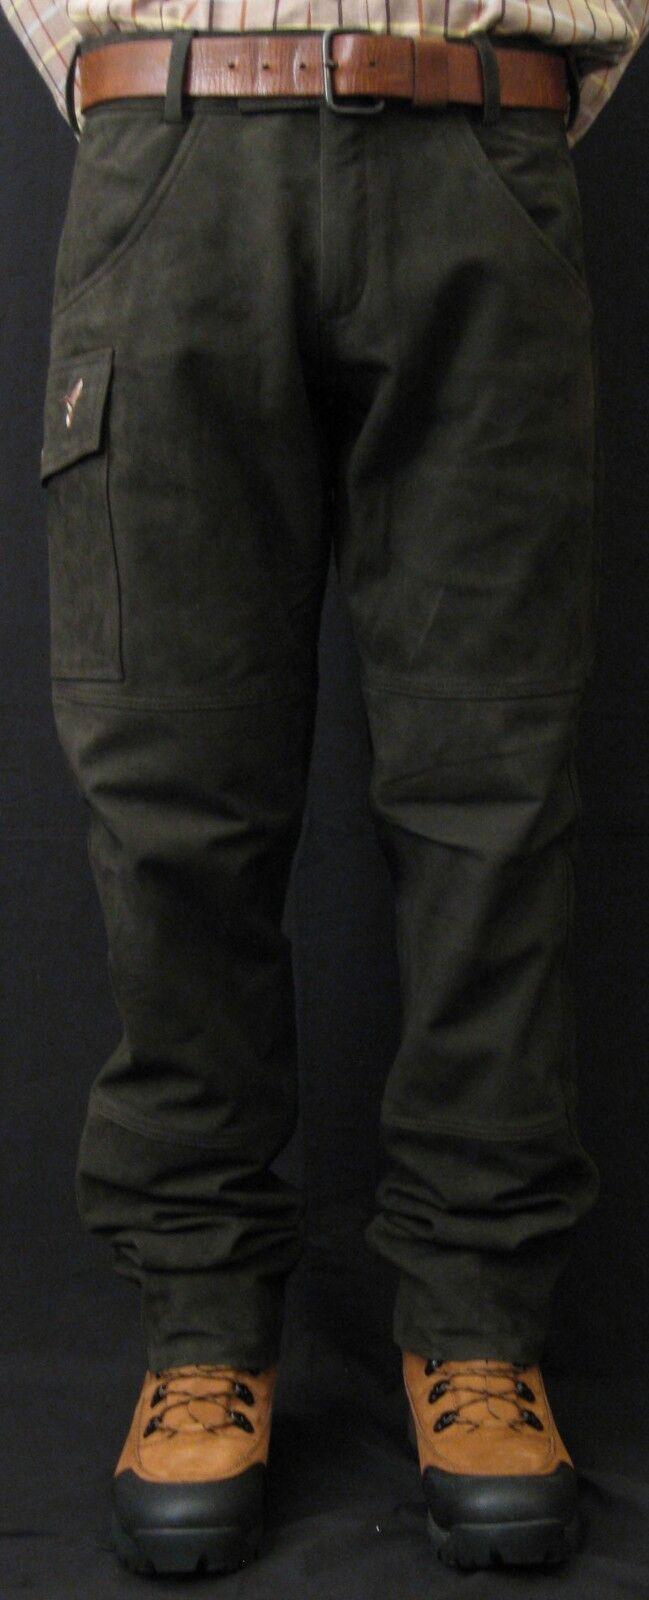 MEN'S BUFFALO LEATHER HUNTING PANTS